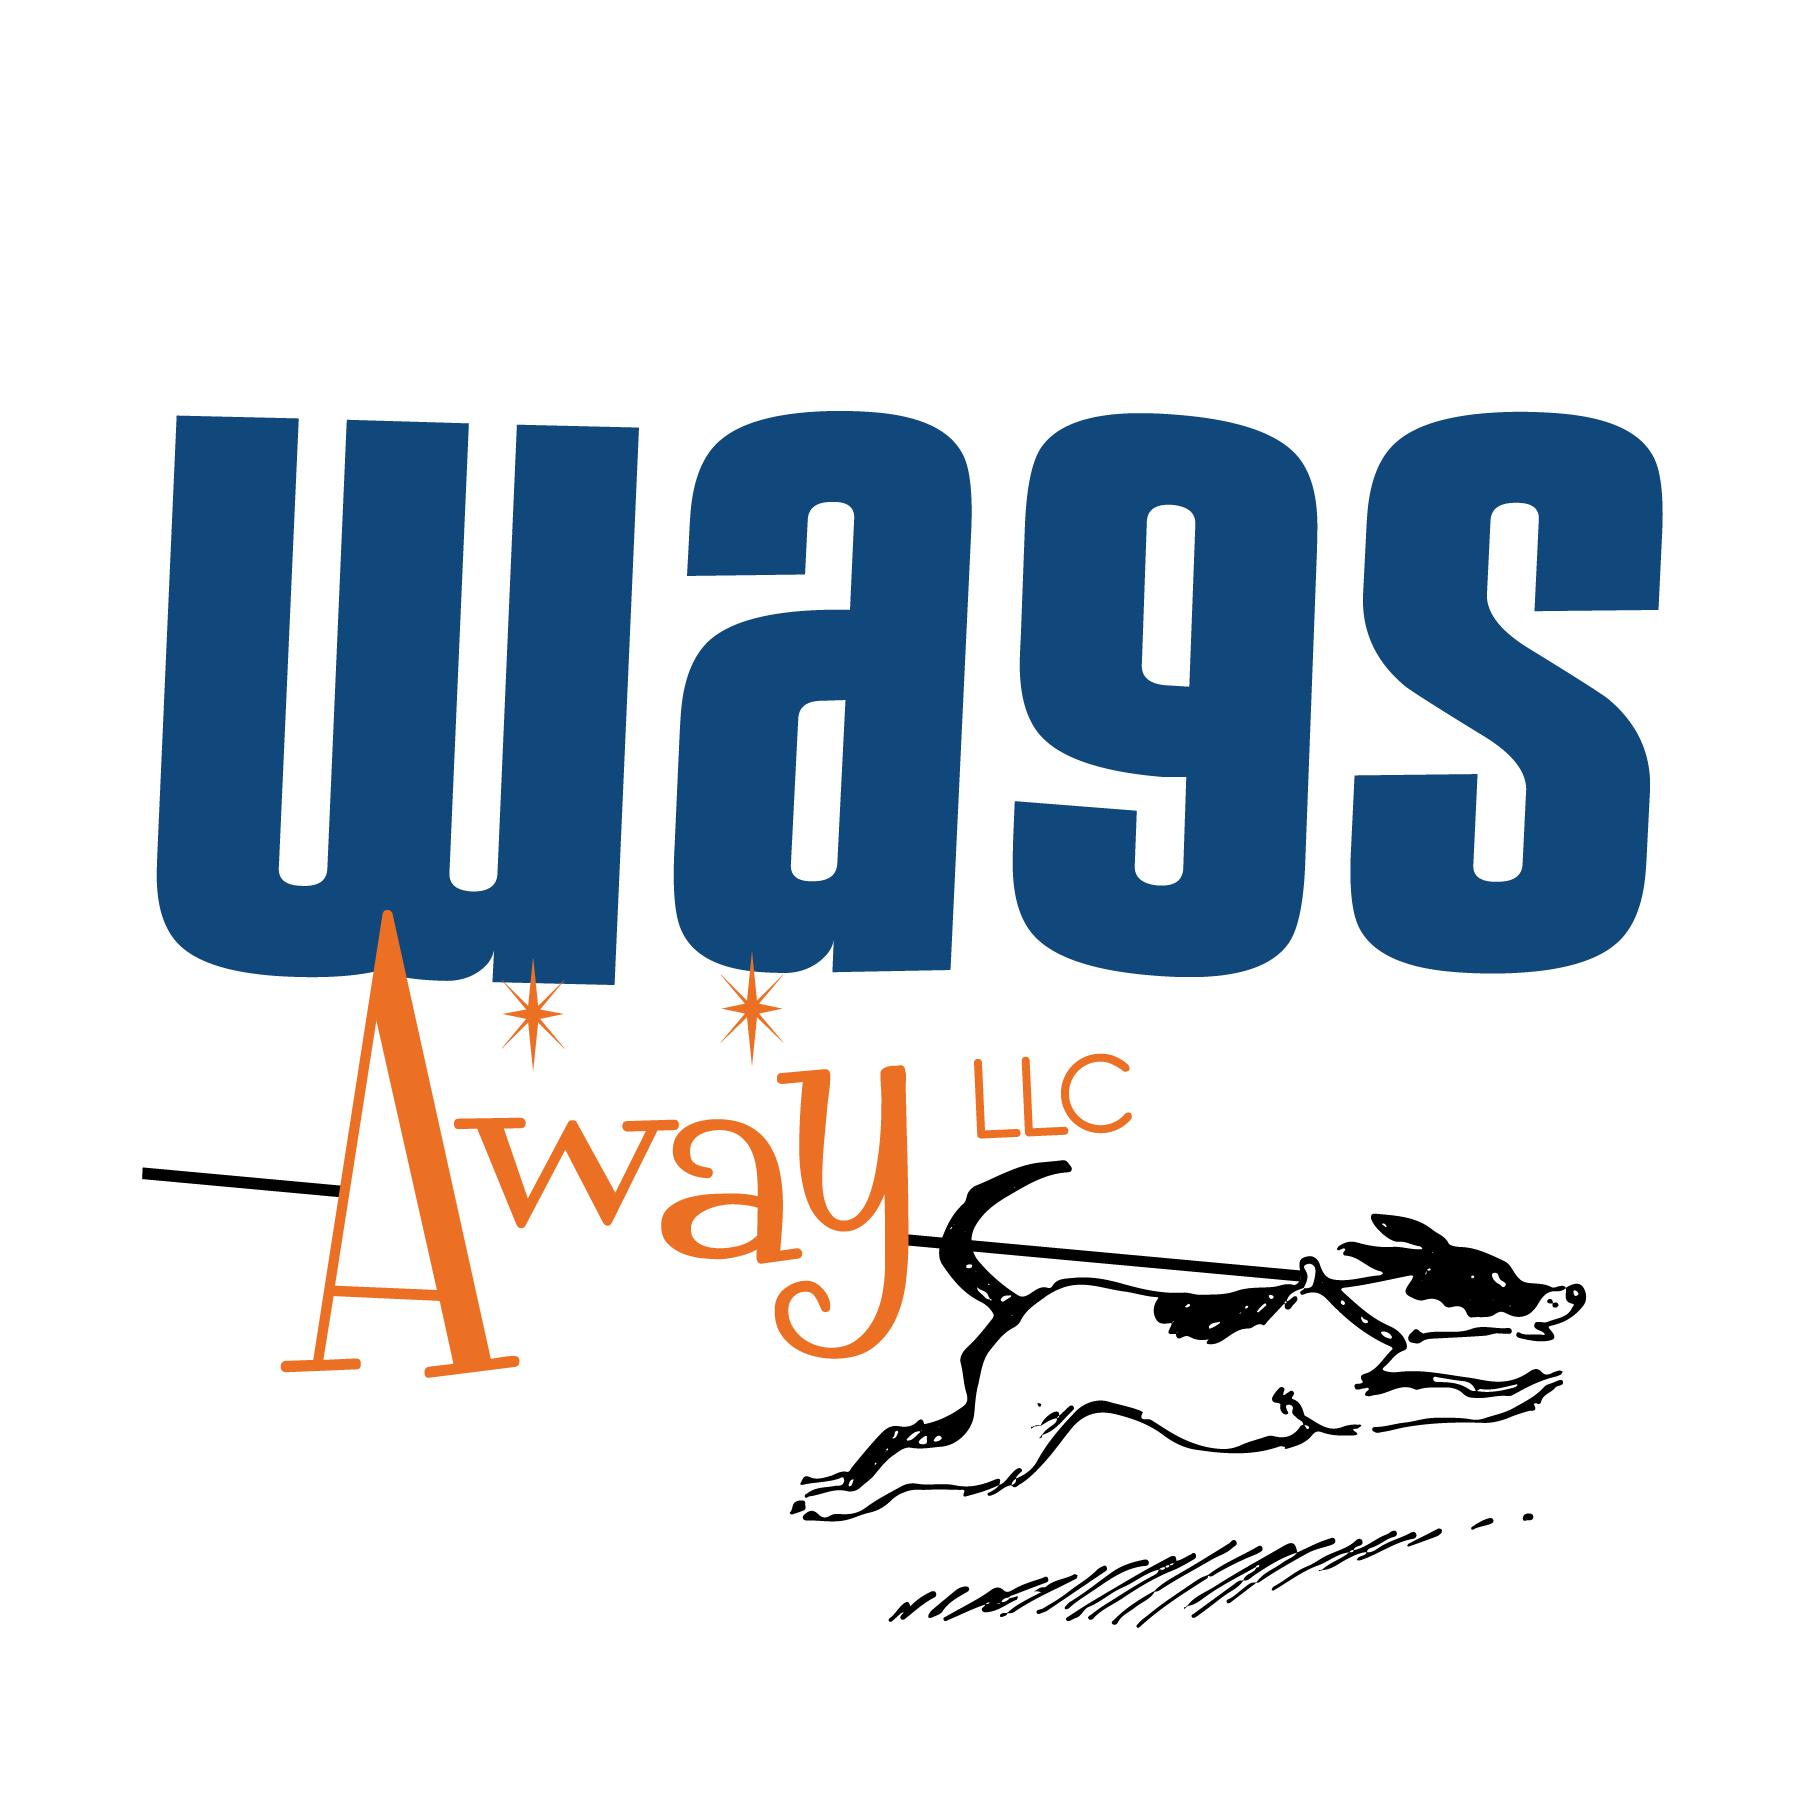 WAGS AWAY LLC